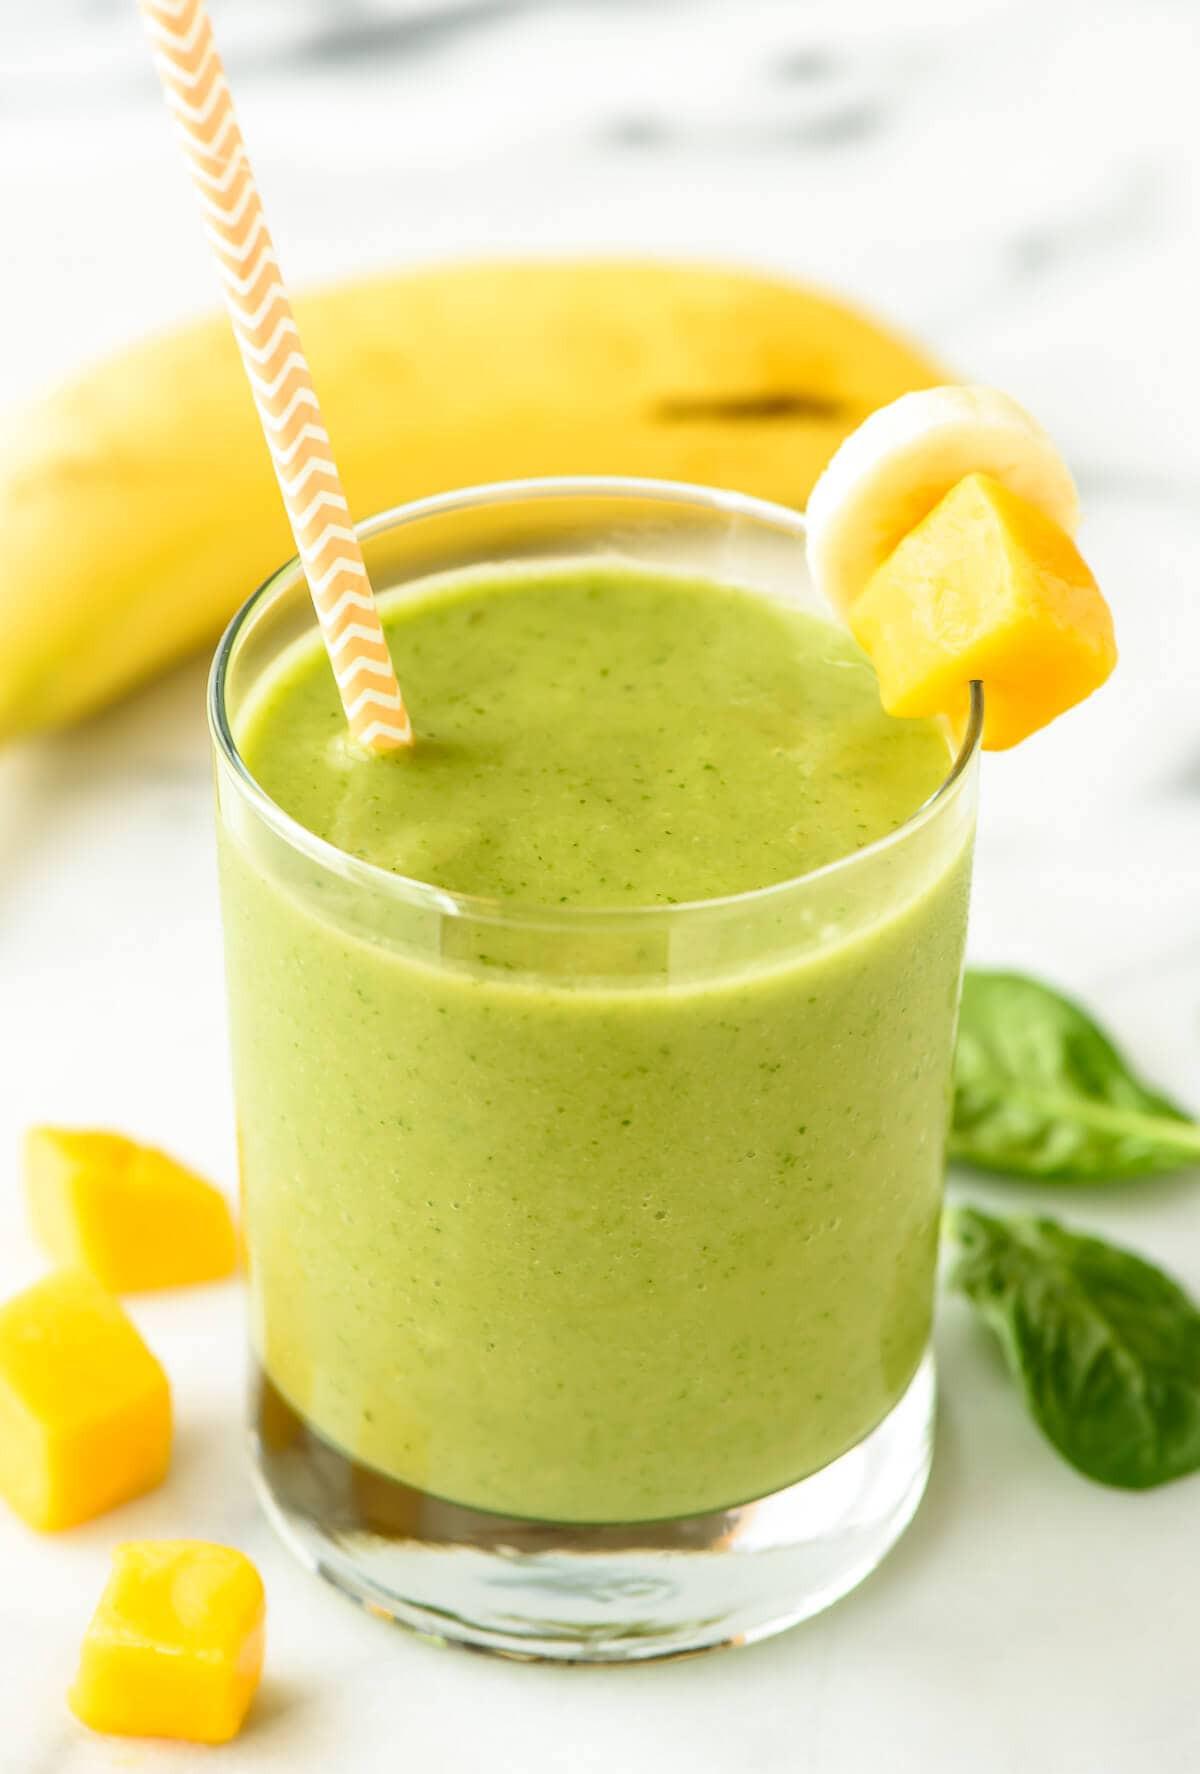 Healthy Green Smoothies  4 Ingre nt Mango Green Smoothie